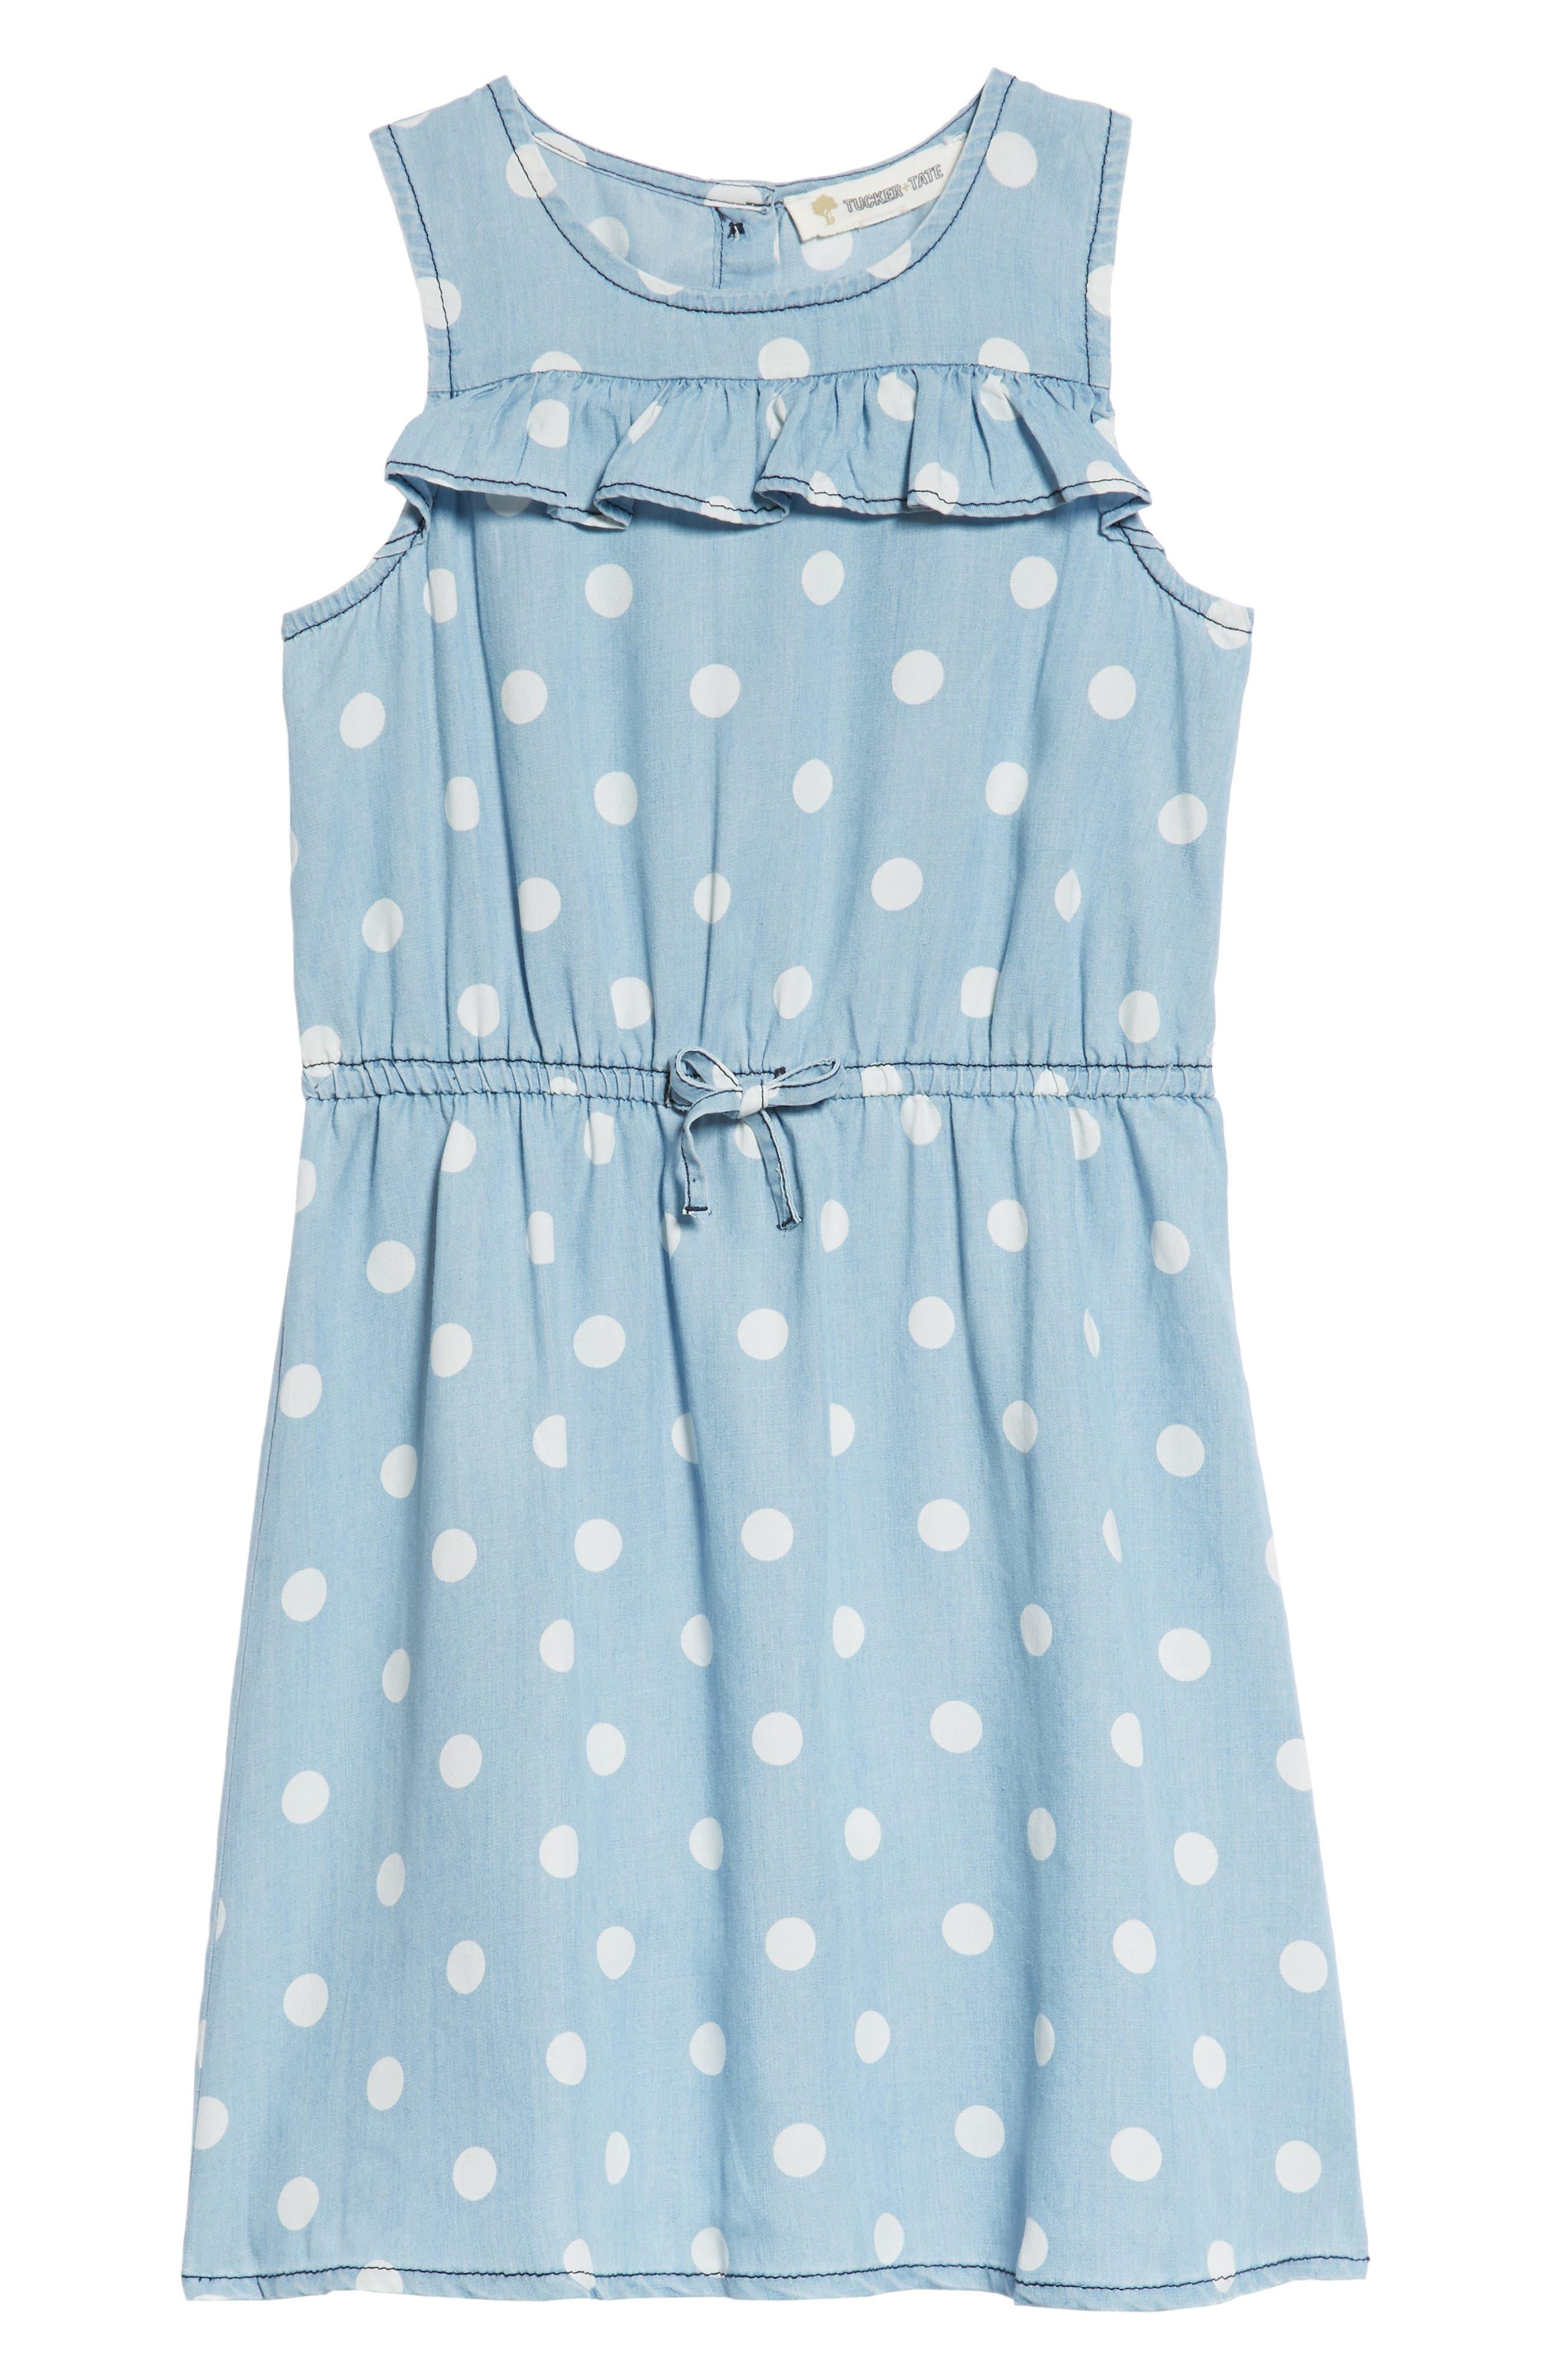 Tucker + Tate Polka Dot Ruffle Dress (Toddler Girls, Little Girls & Big Girls)